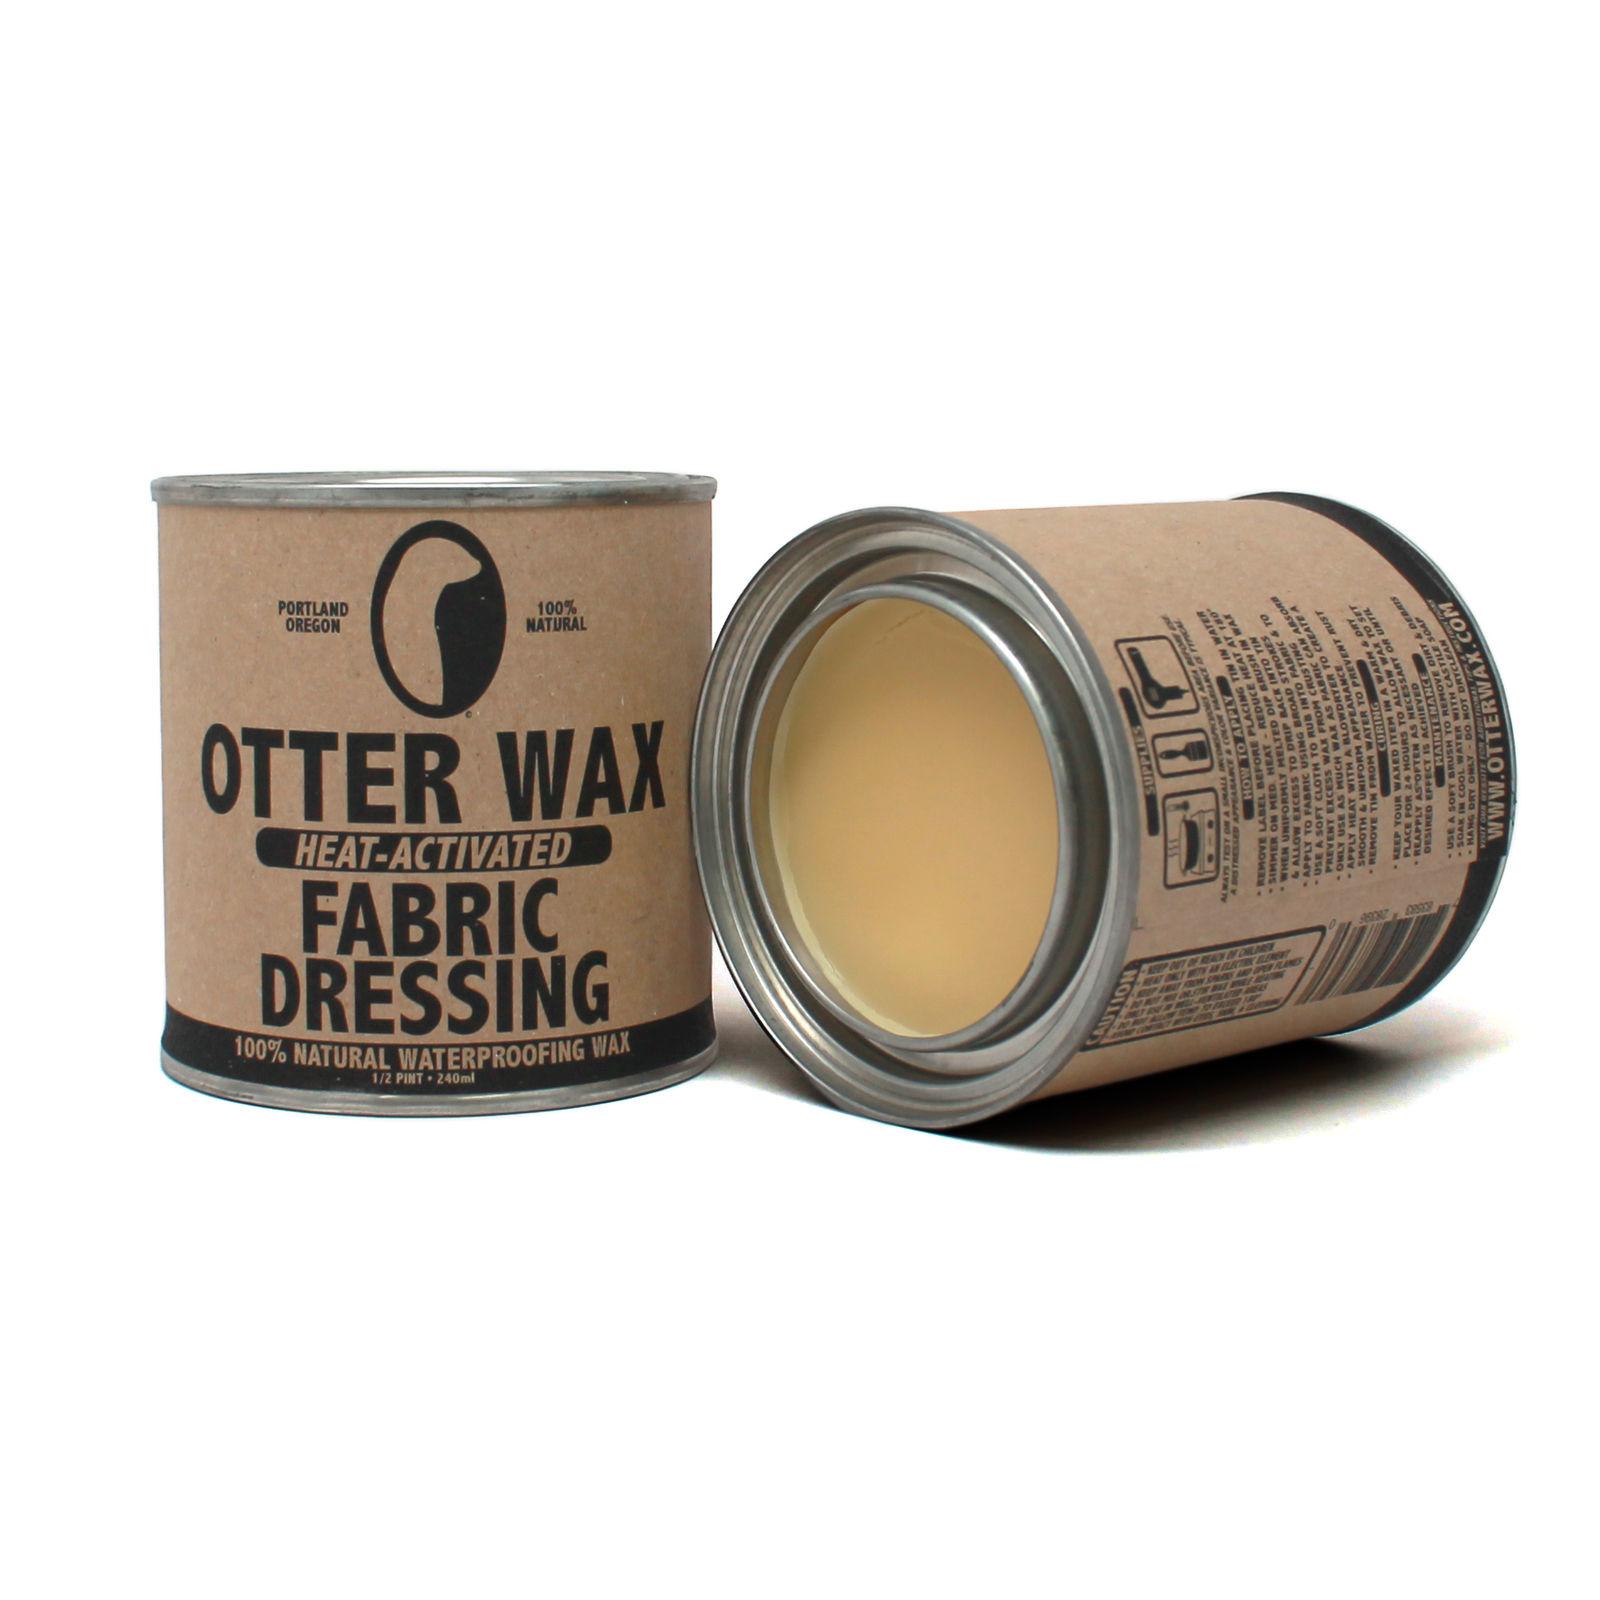 OTTER WAX (Bild 2)